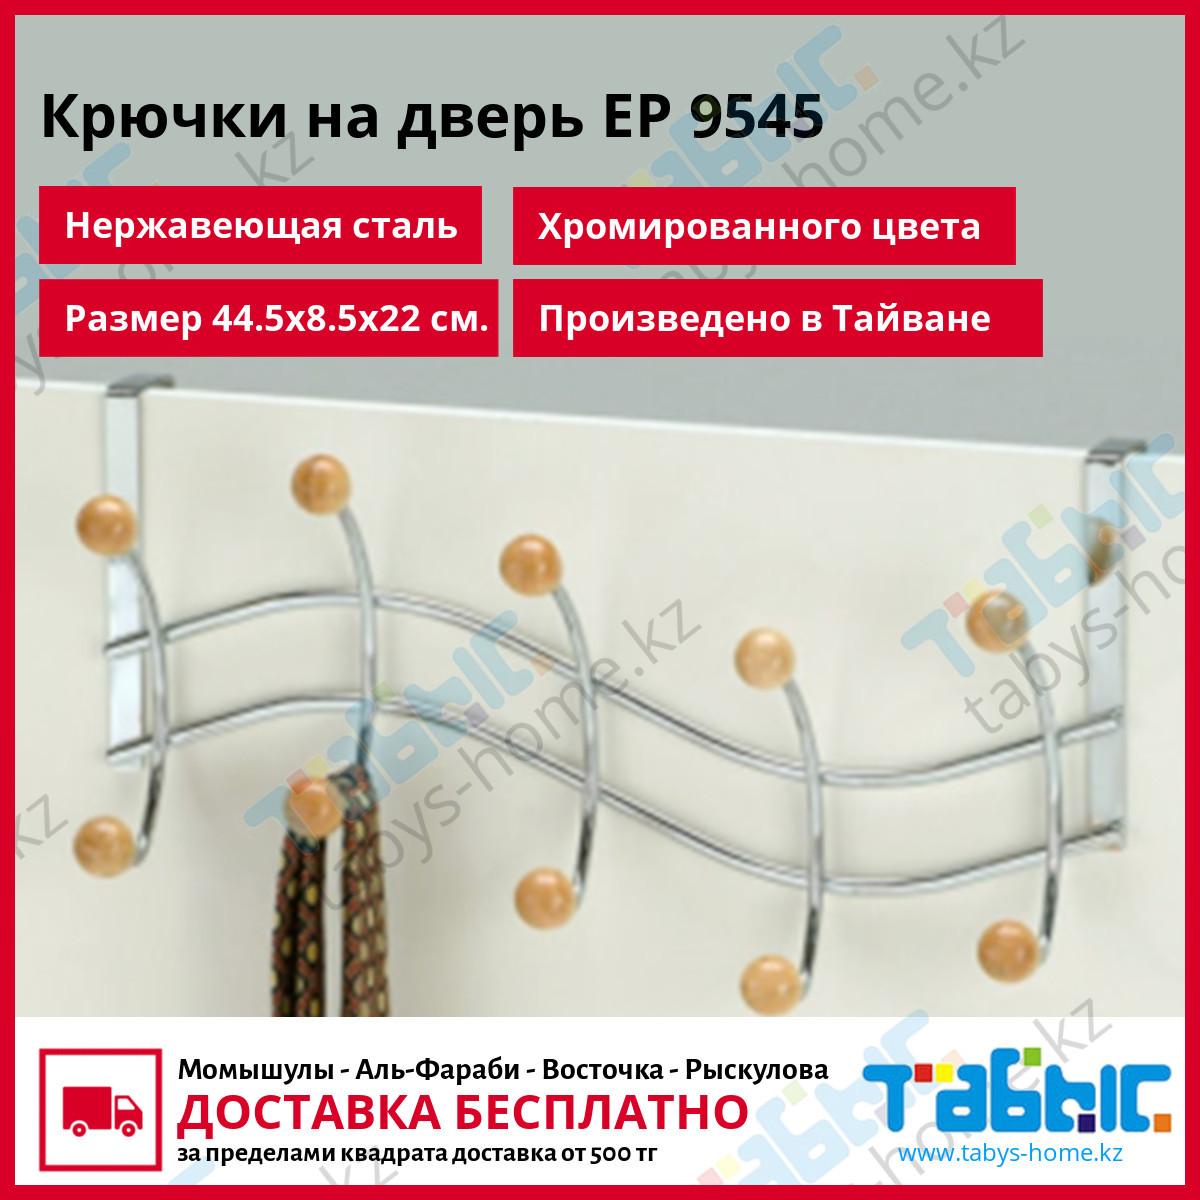 Крючки на дверь ЕР 9545